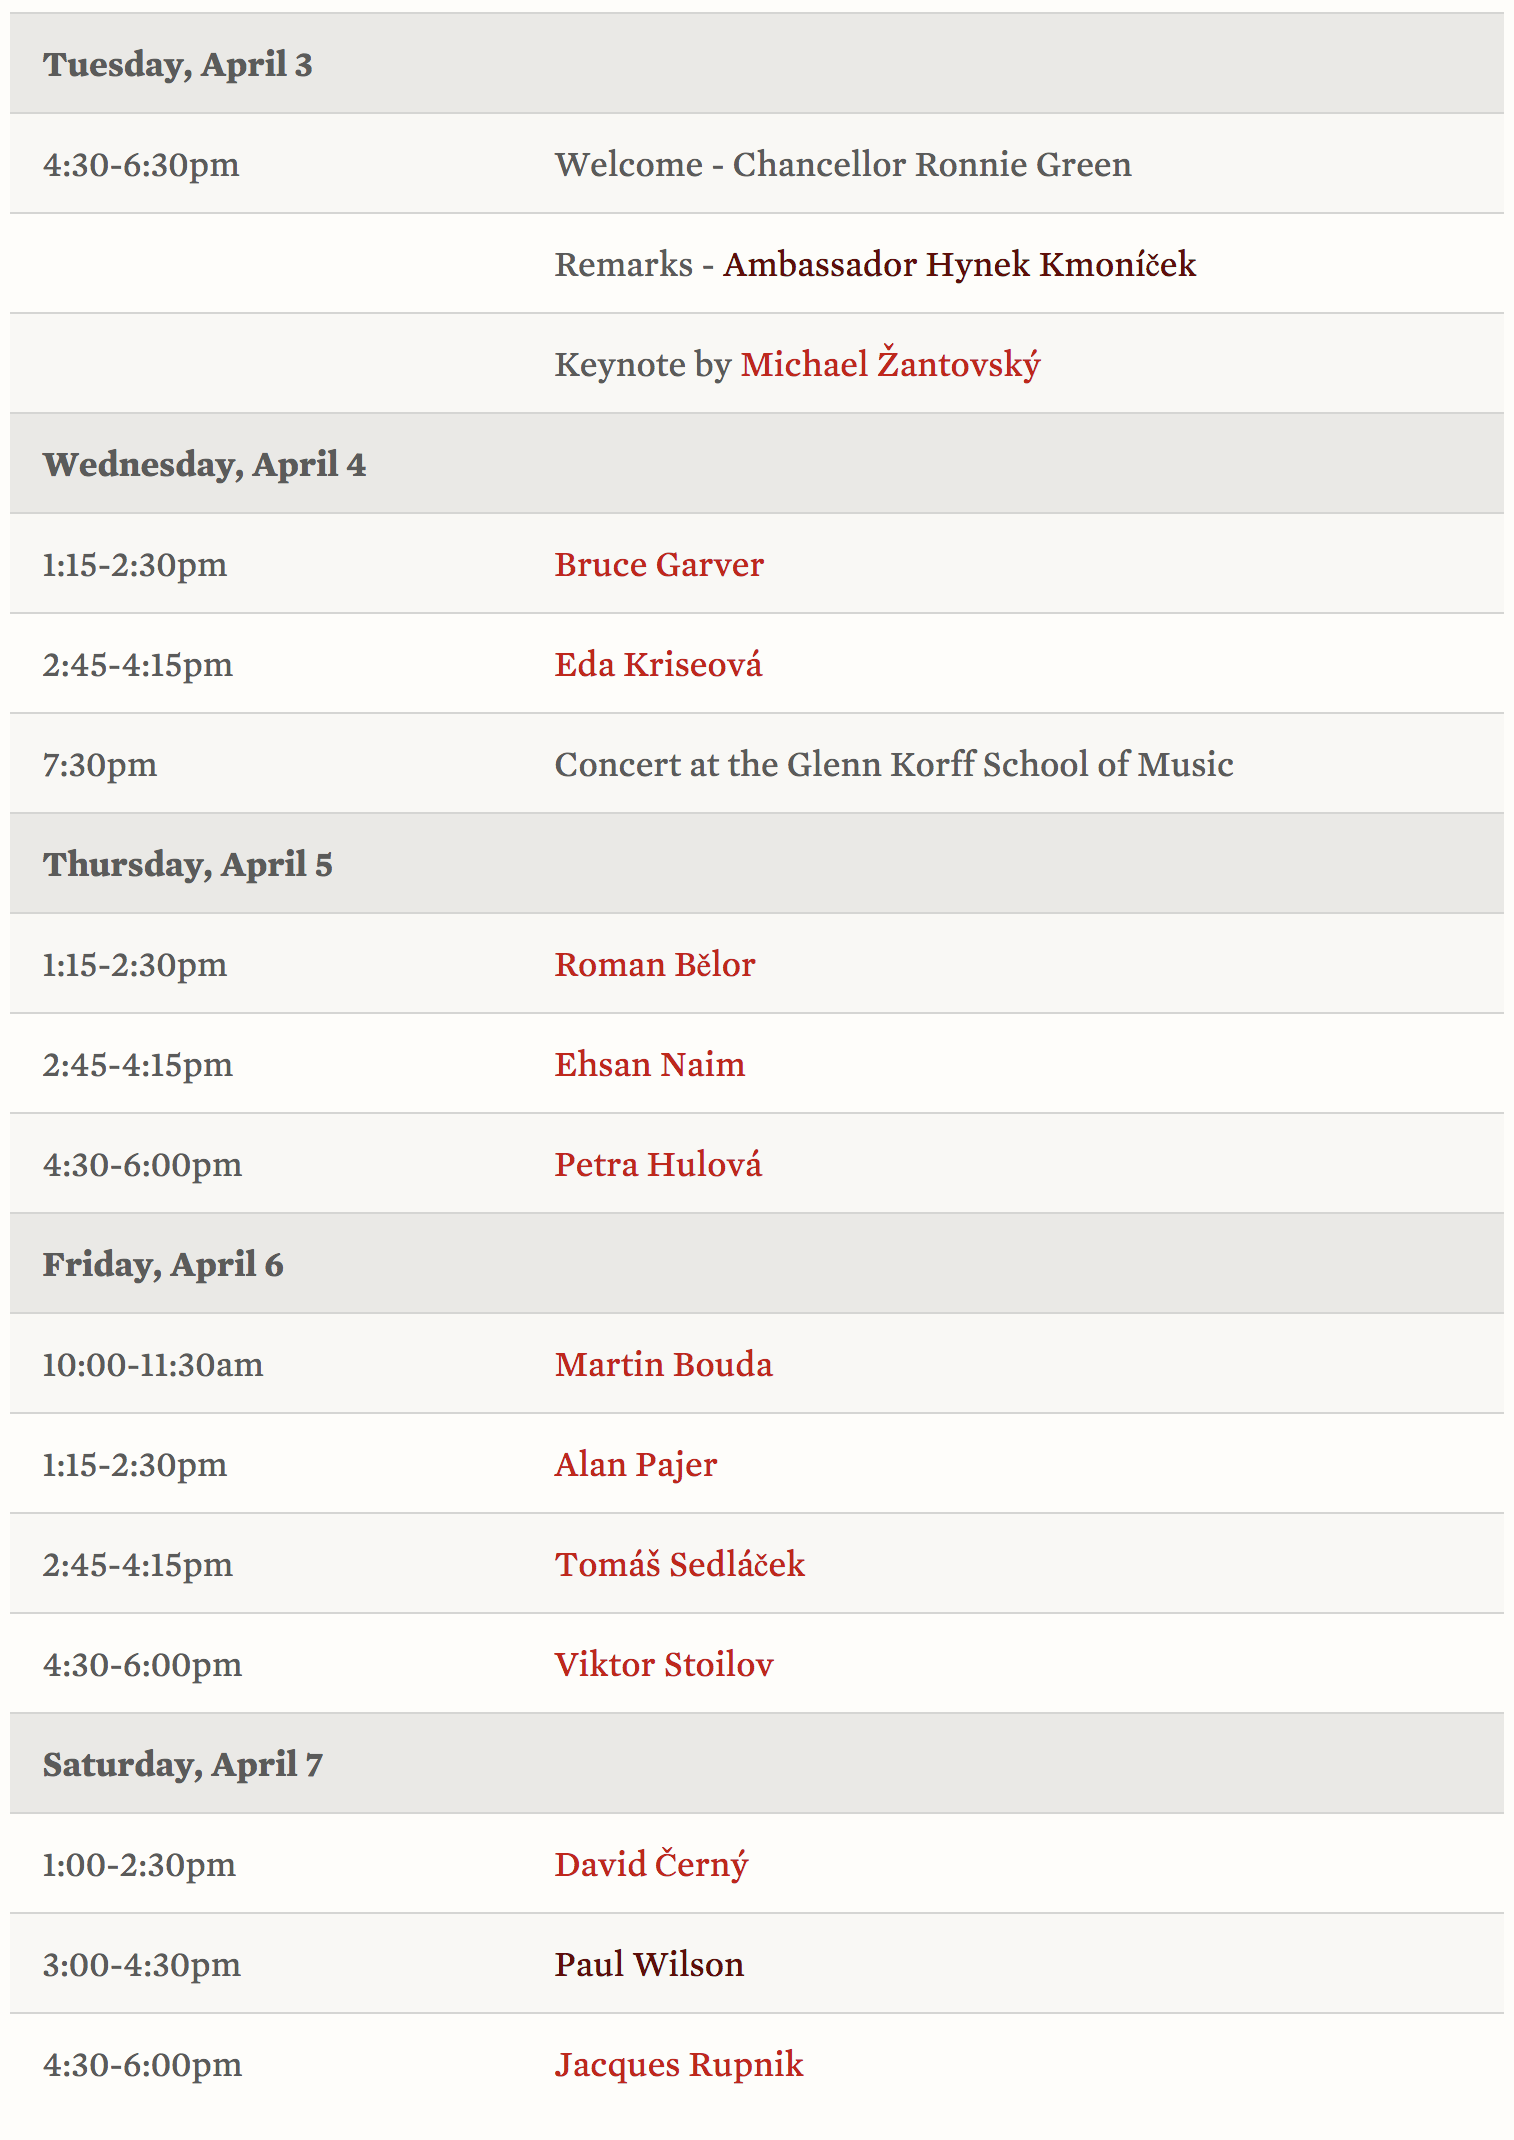 Prague Spring 50 Schedule of events